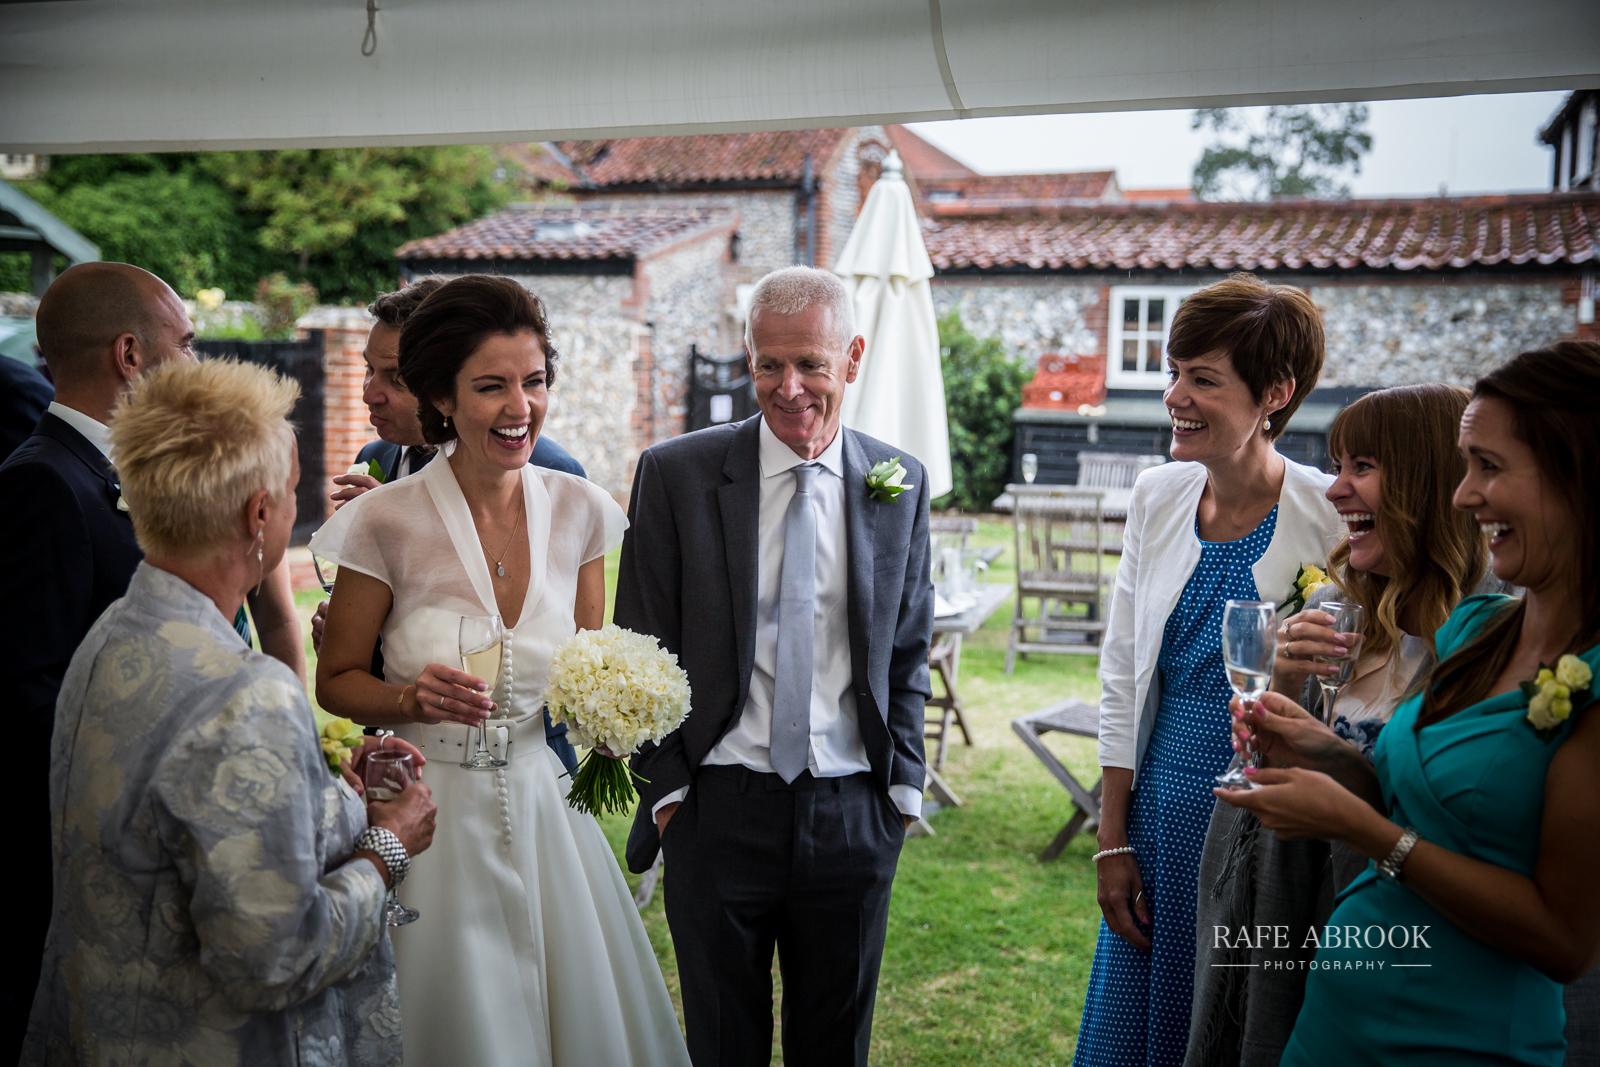 cley windmill wedding norfolk hertfordshire wedding photographer-1199.jpg